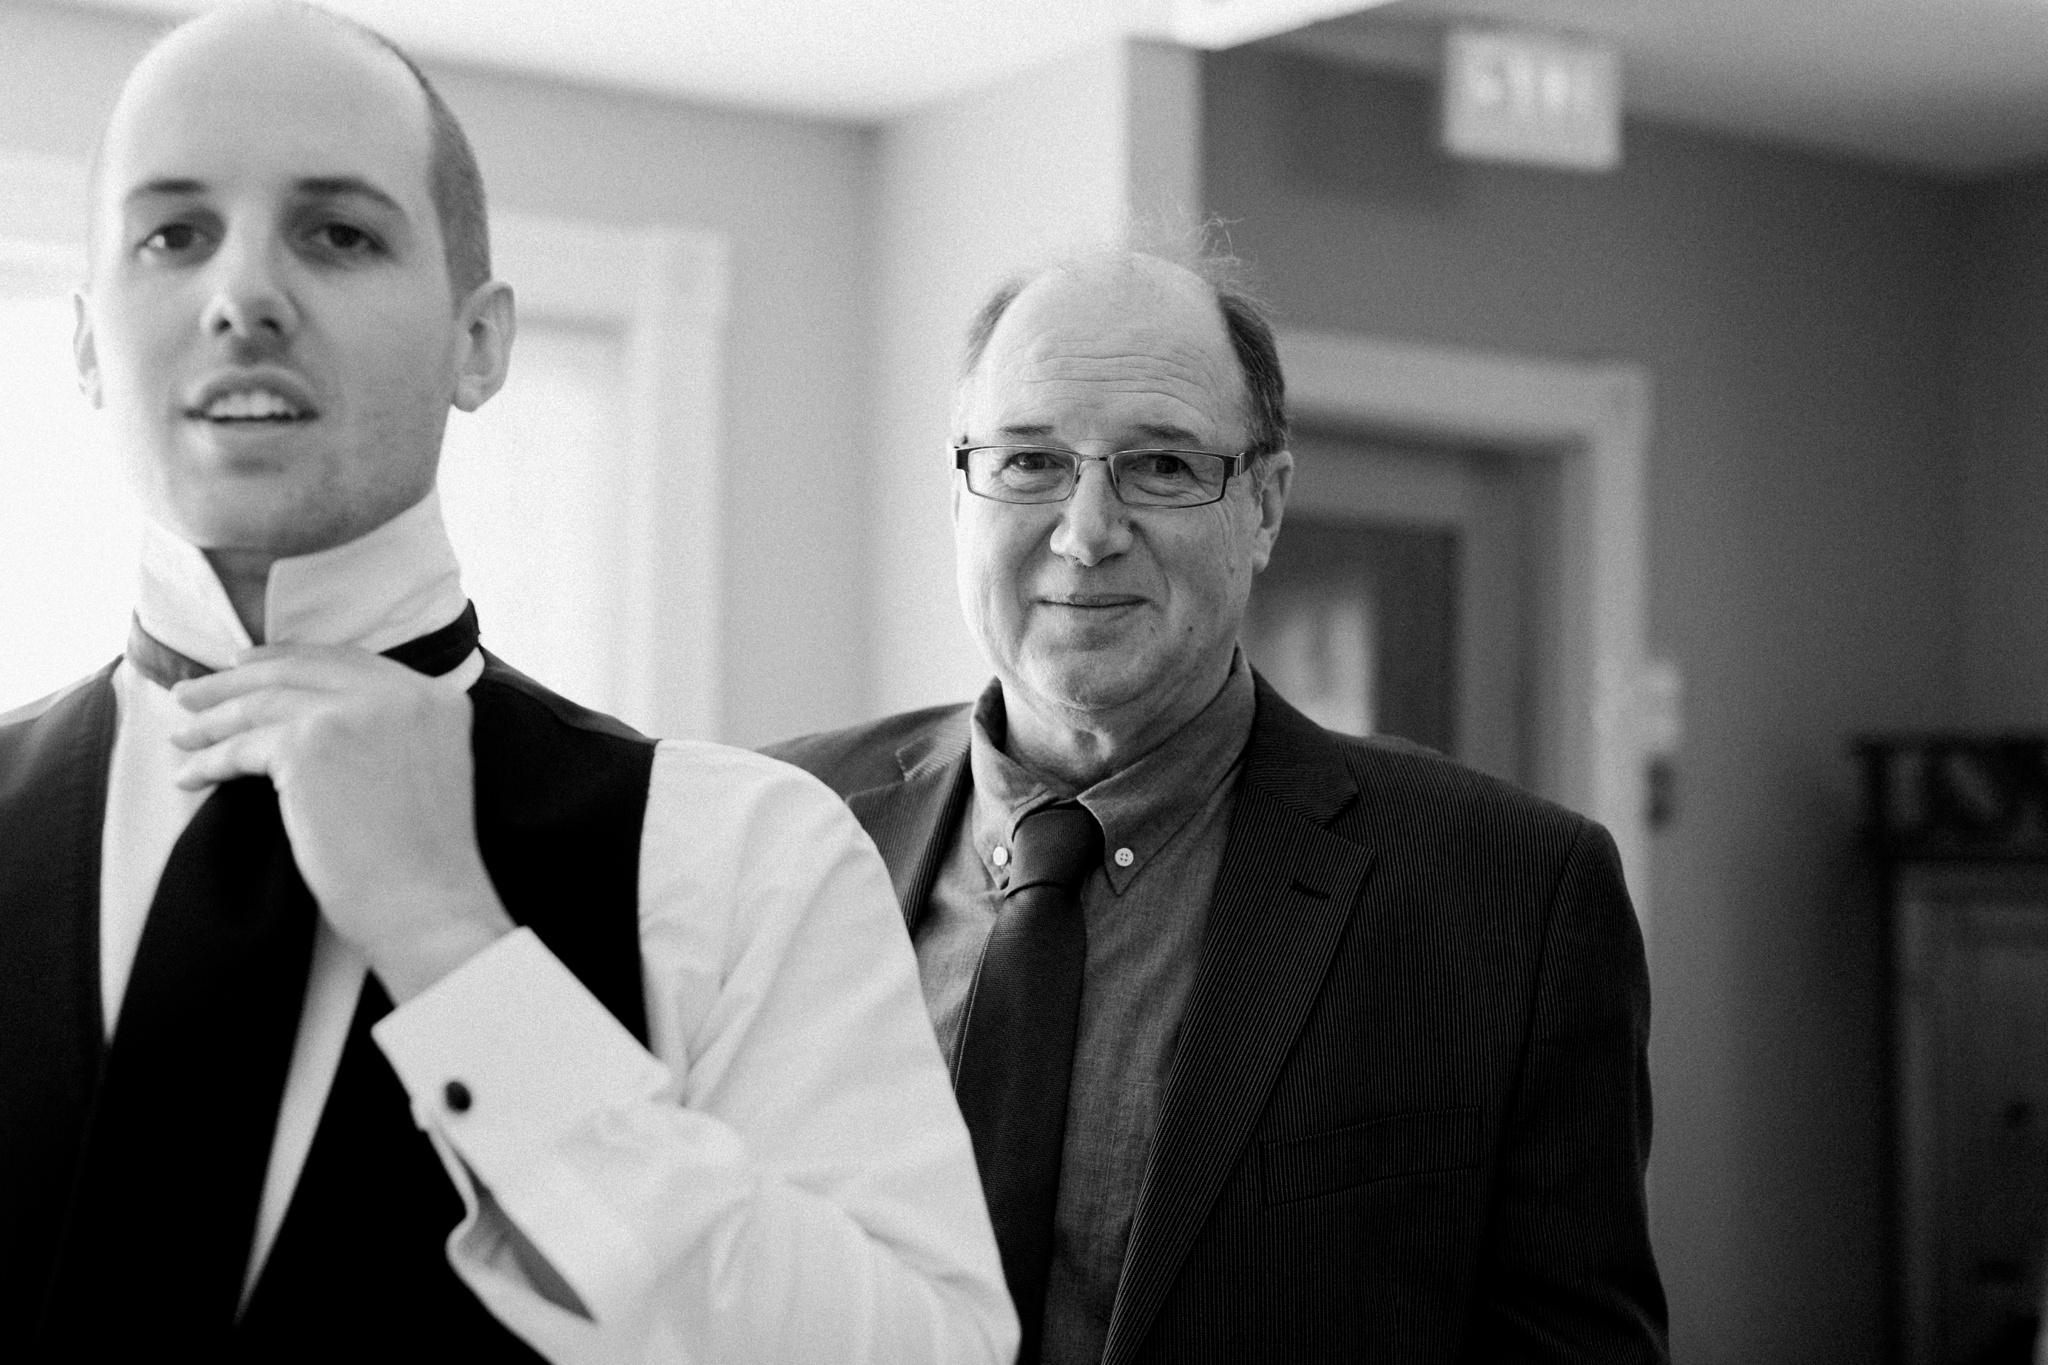 Durham Region Wedding Photographer, Toronto Wedding Photographer, Peterborough Wedding Photographer